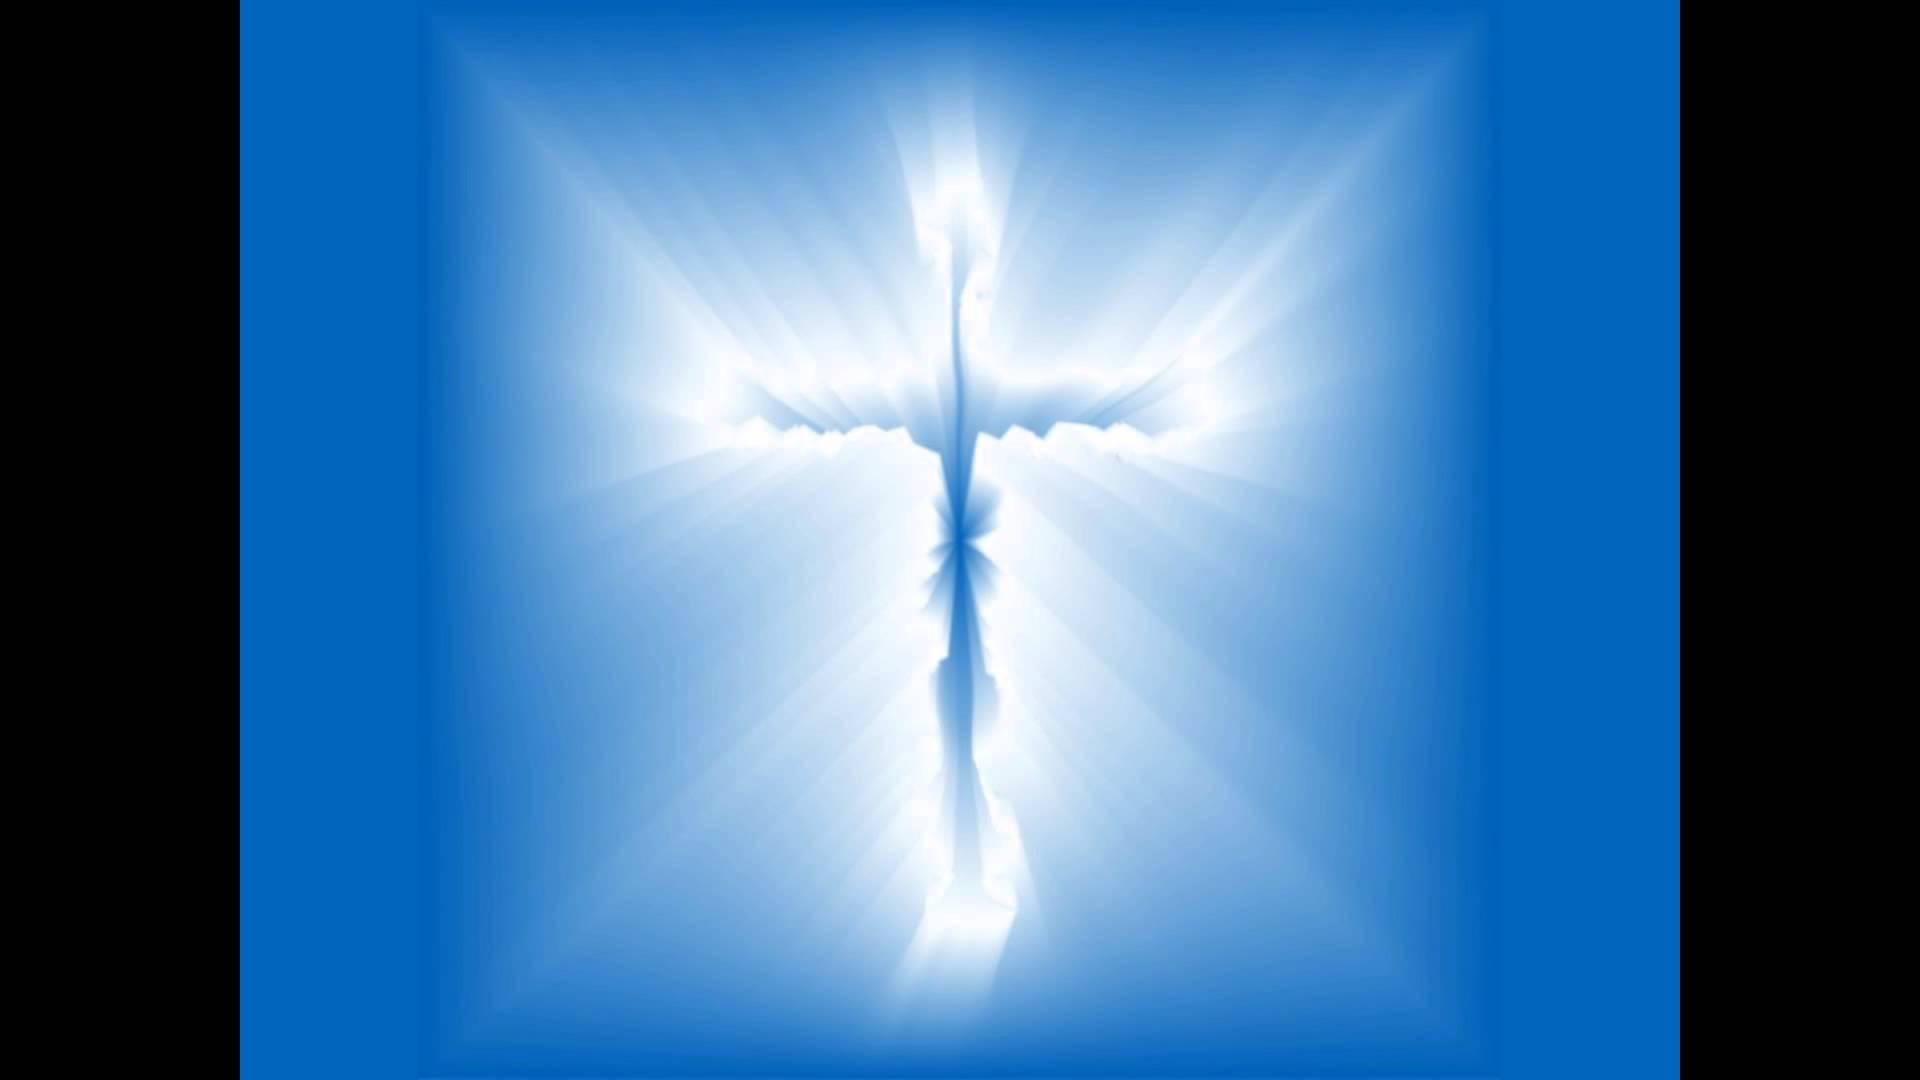 Opwekking 638 - Prijs Adonai 2